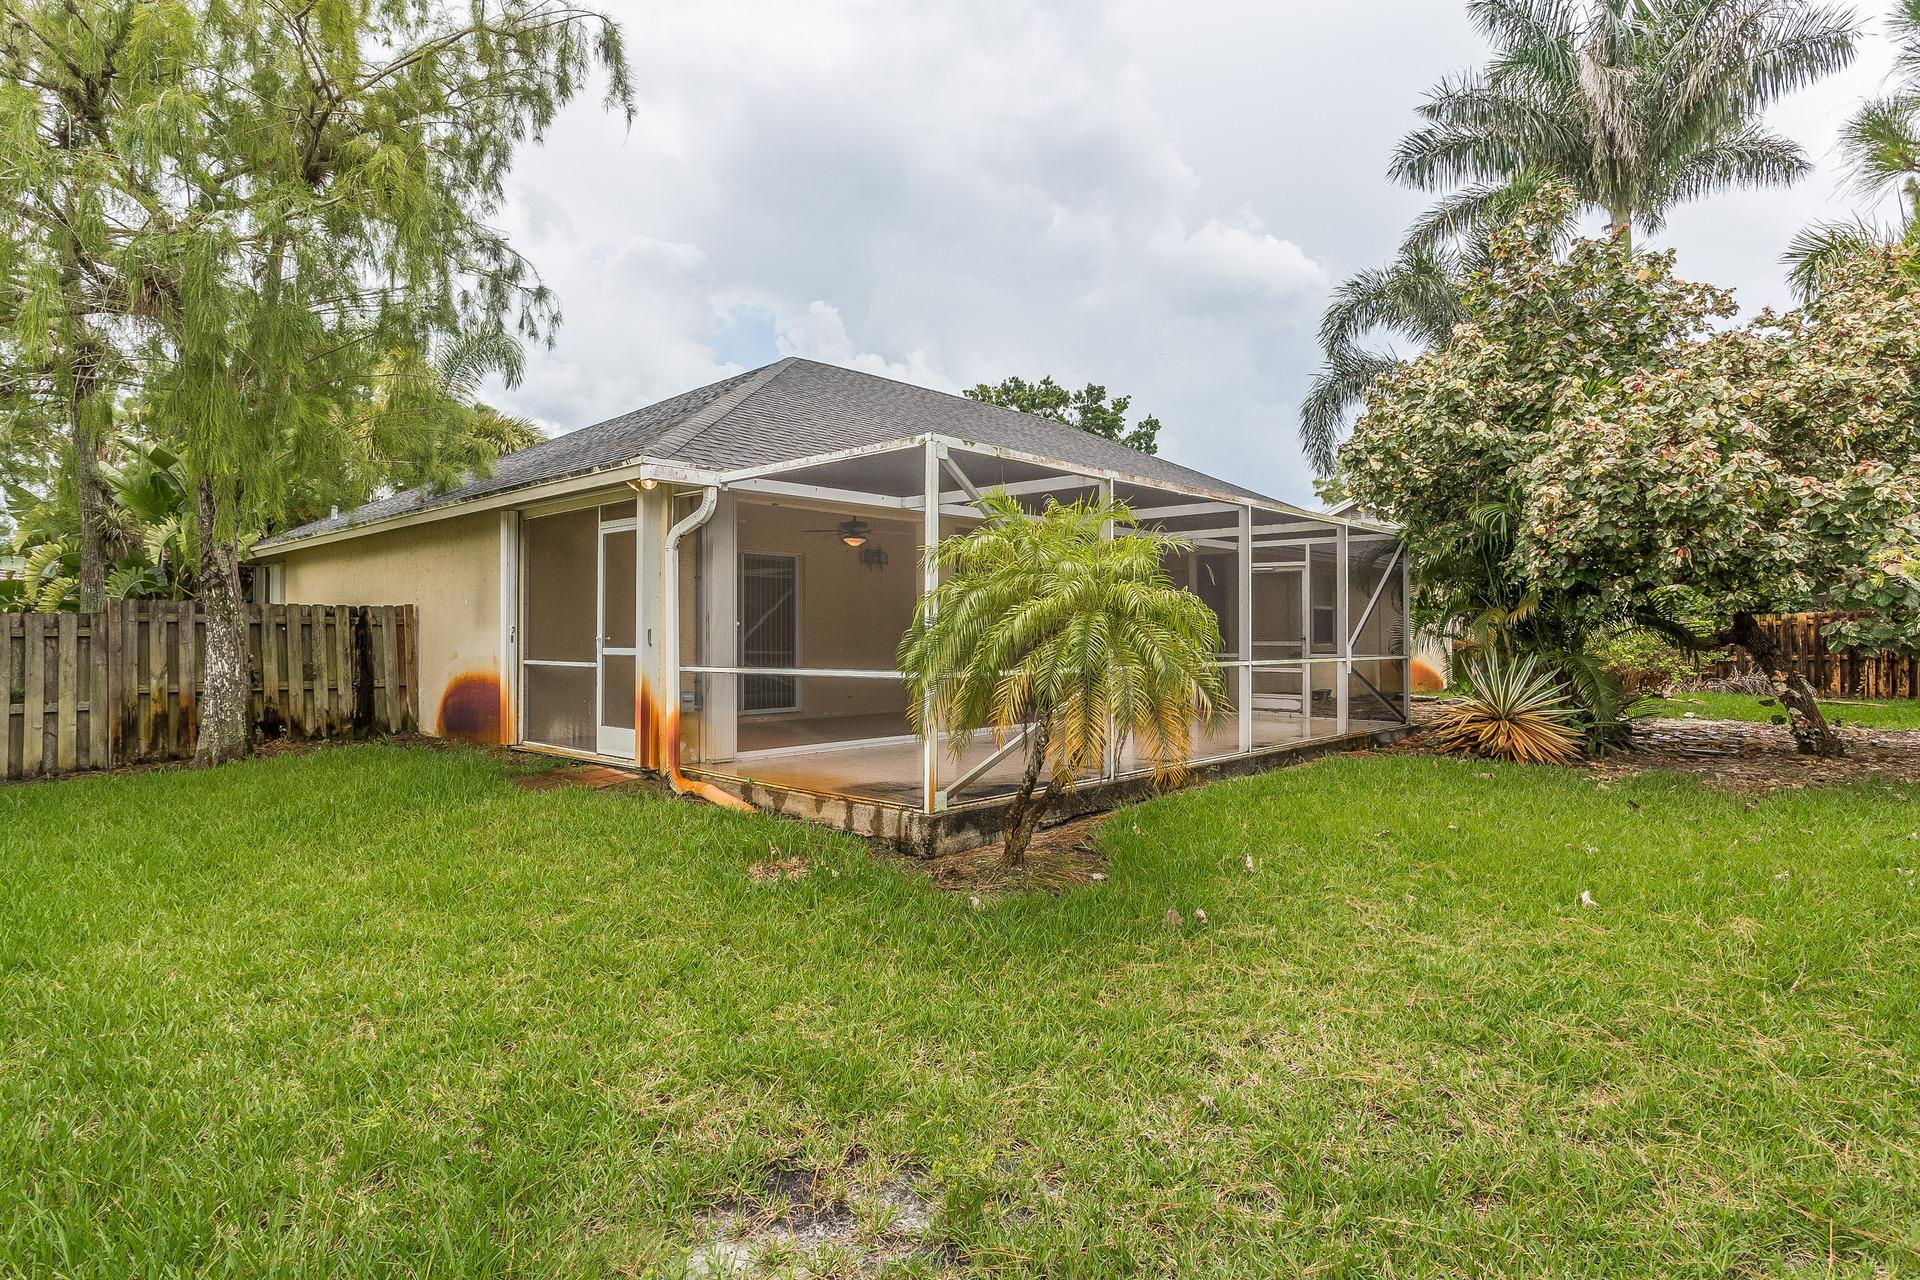 Photo of 13582 Callington Dr, Wellington, FL, 33414